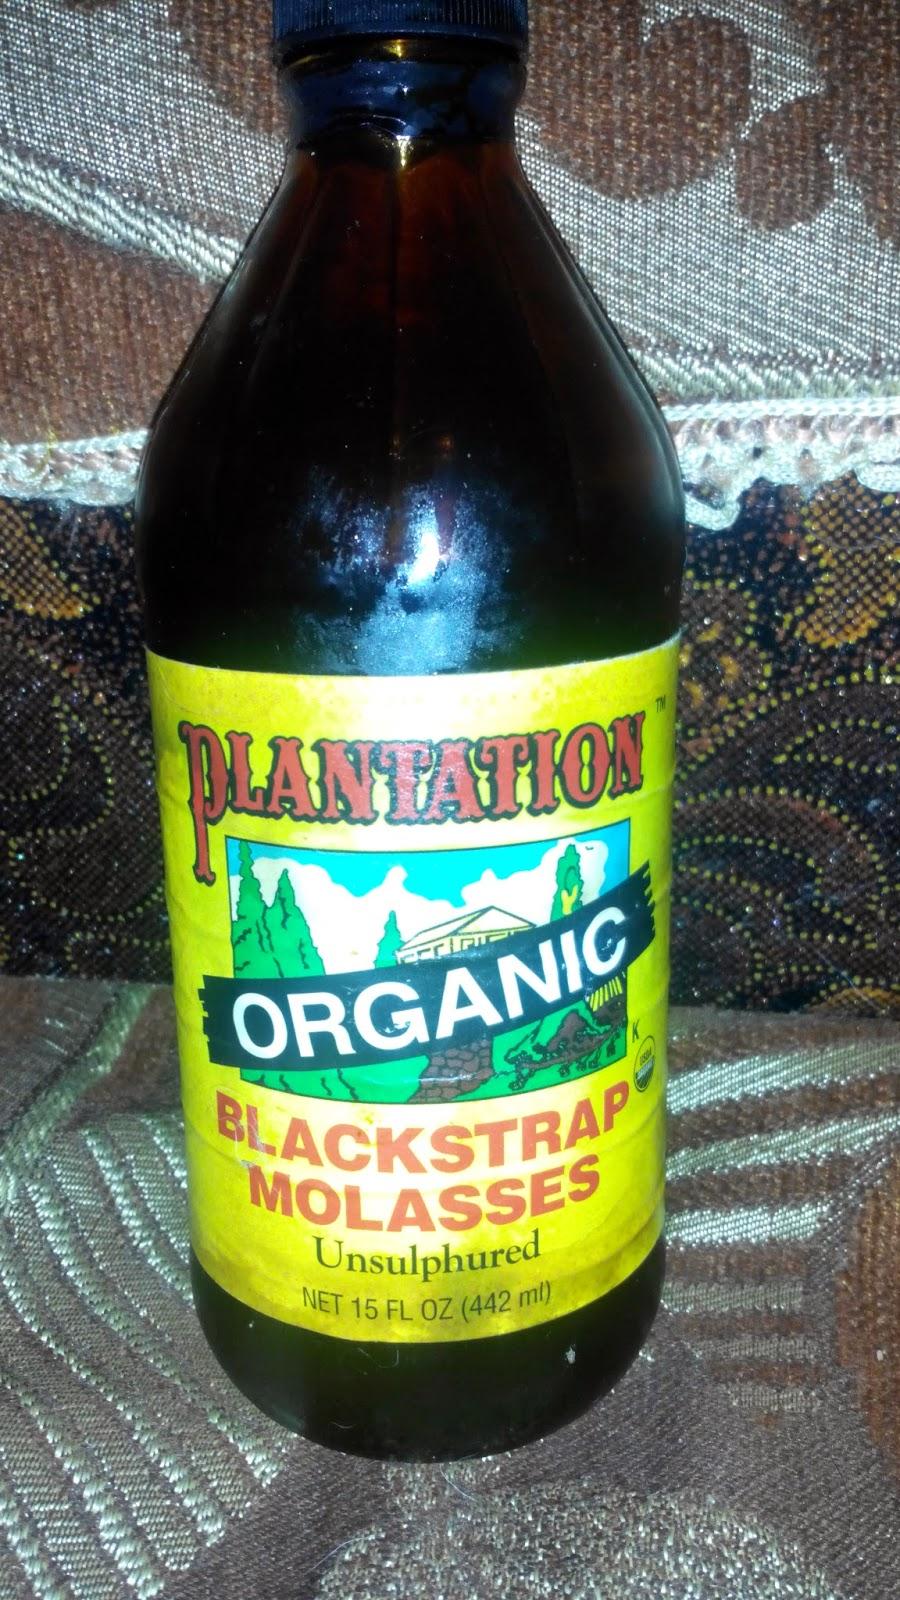 Plantation Organic Blackstrap Molasses Benefits